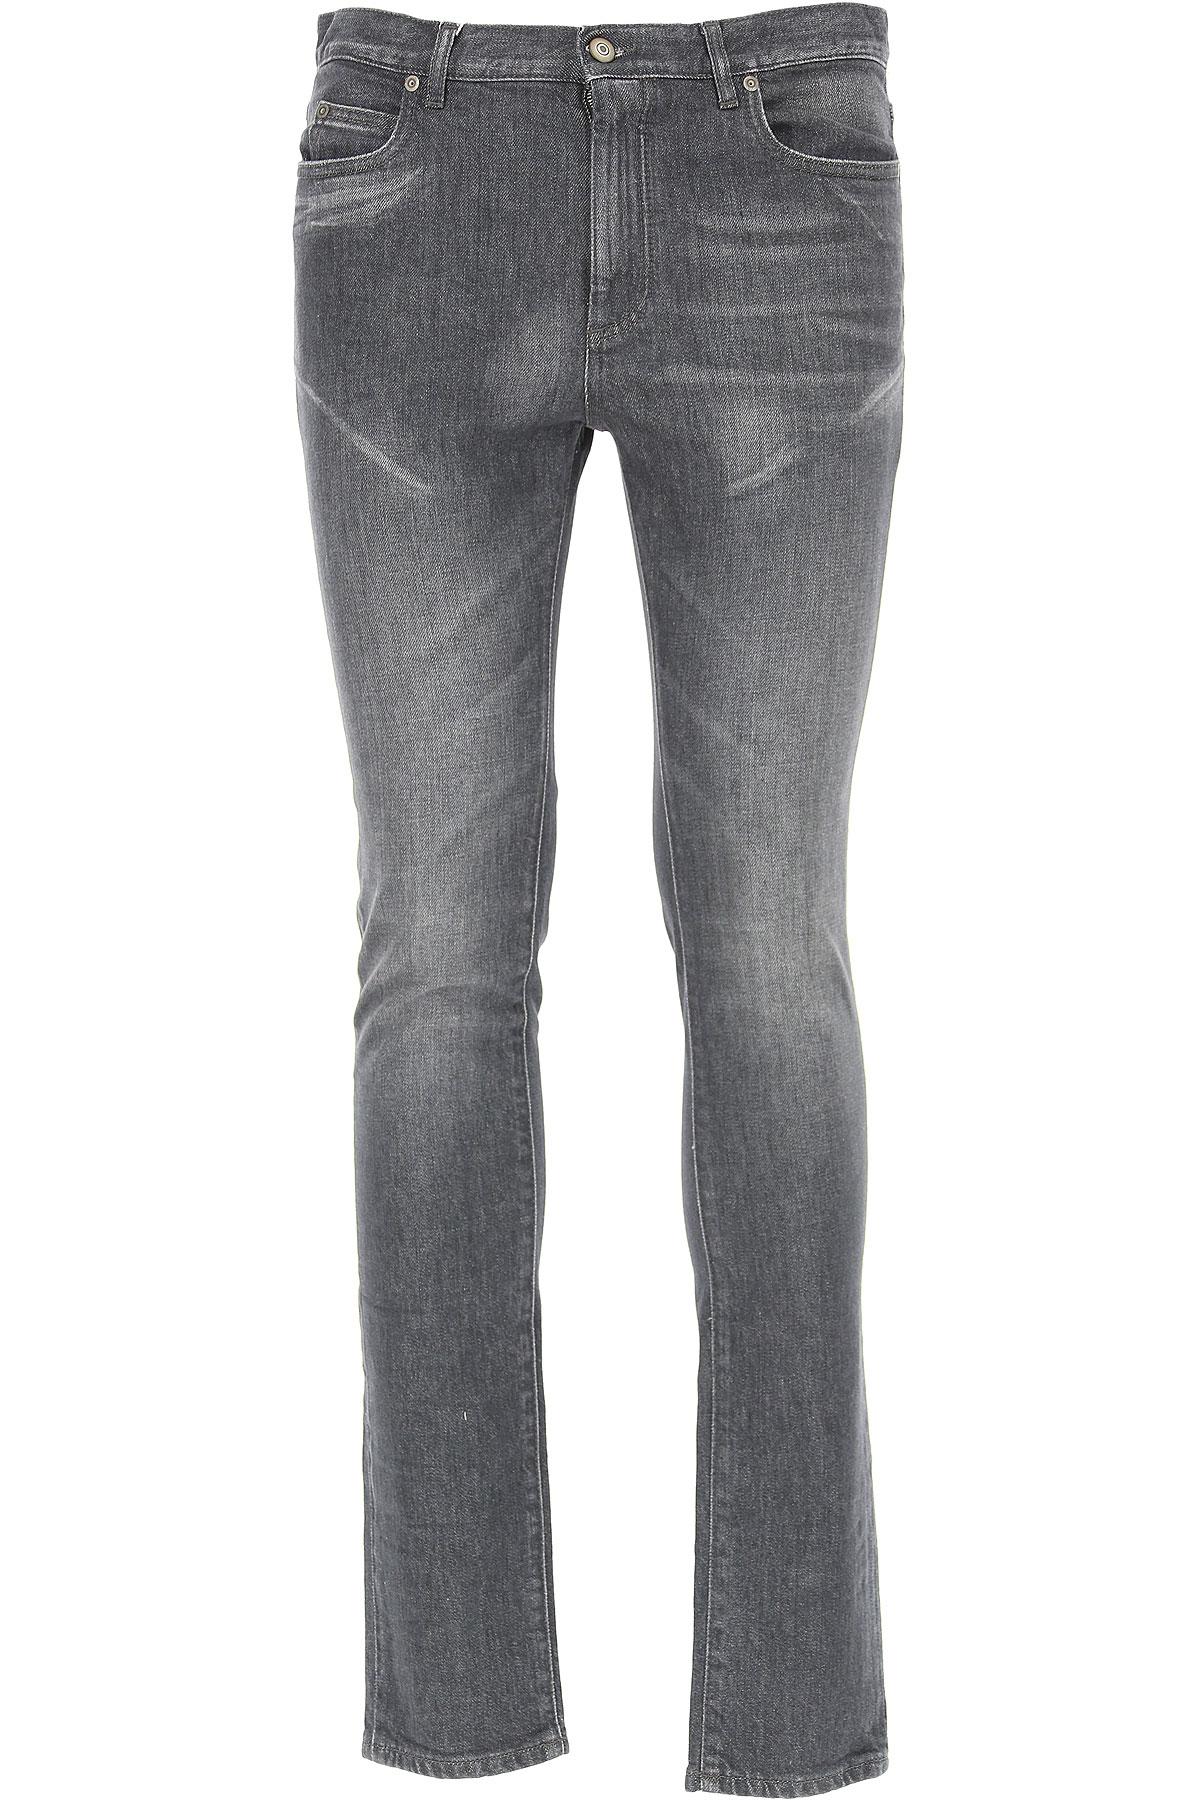 Maison Martin Margiela Jeans On Sale, Grey, Cotton, 2017, 29 30 31 32 33 34 USA-466678